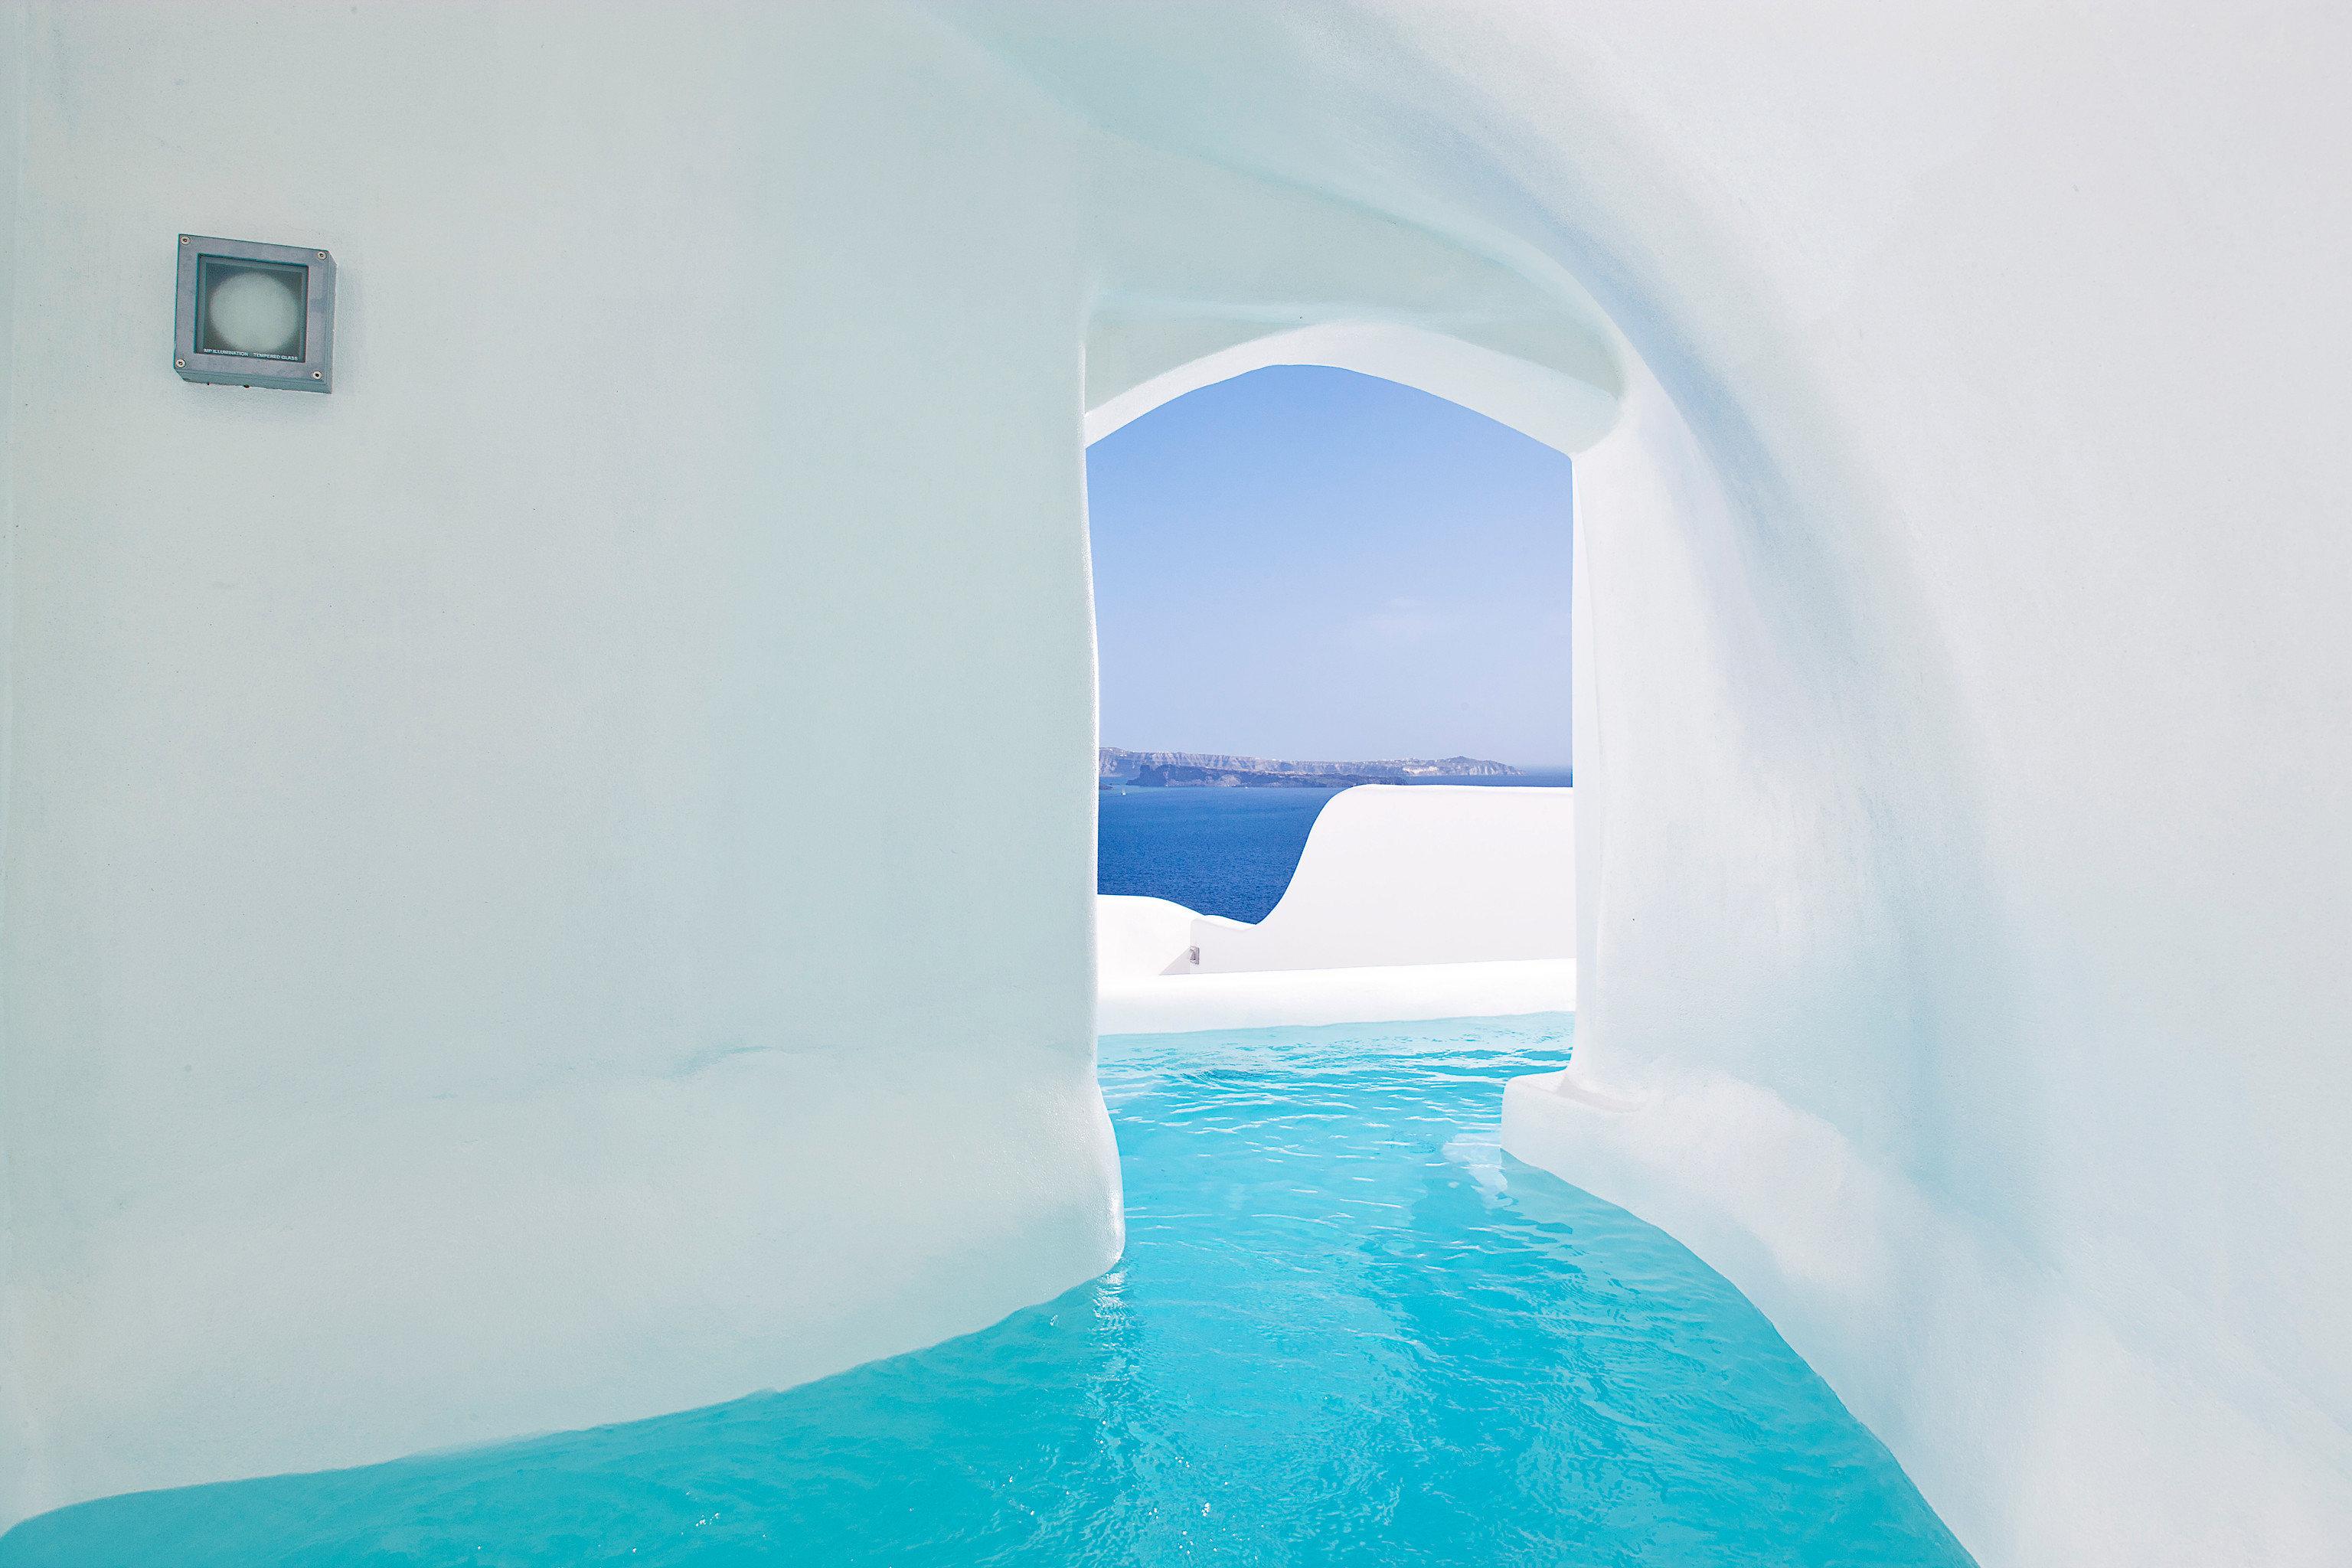 Bedroom Elegant Greece Historic Honeymoon Hot Tub Jacuzzi Hotels Luxury Romance Santorini Waterfront Water